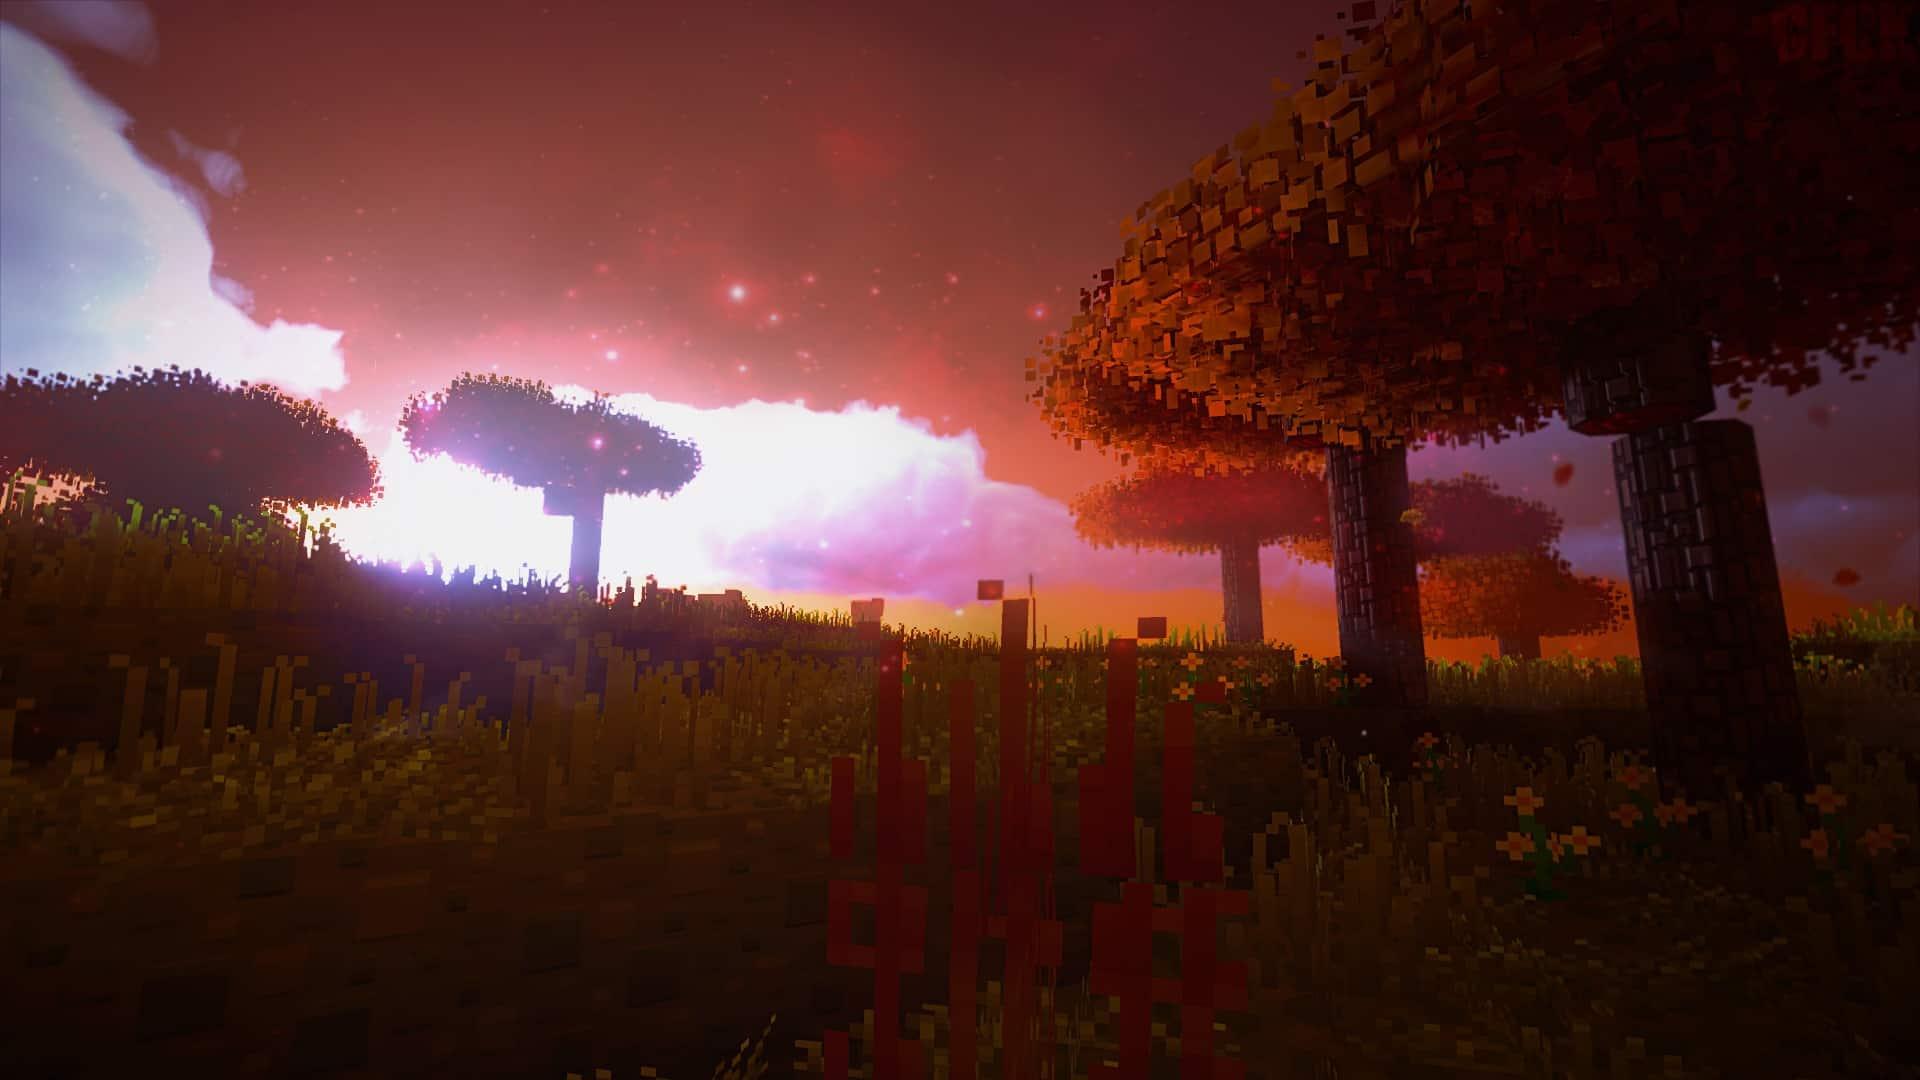 Sélection de fonds d'écran Minecraft - Minecraft-France - Fond D'ecran Minecraft